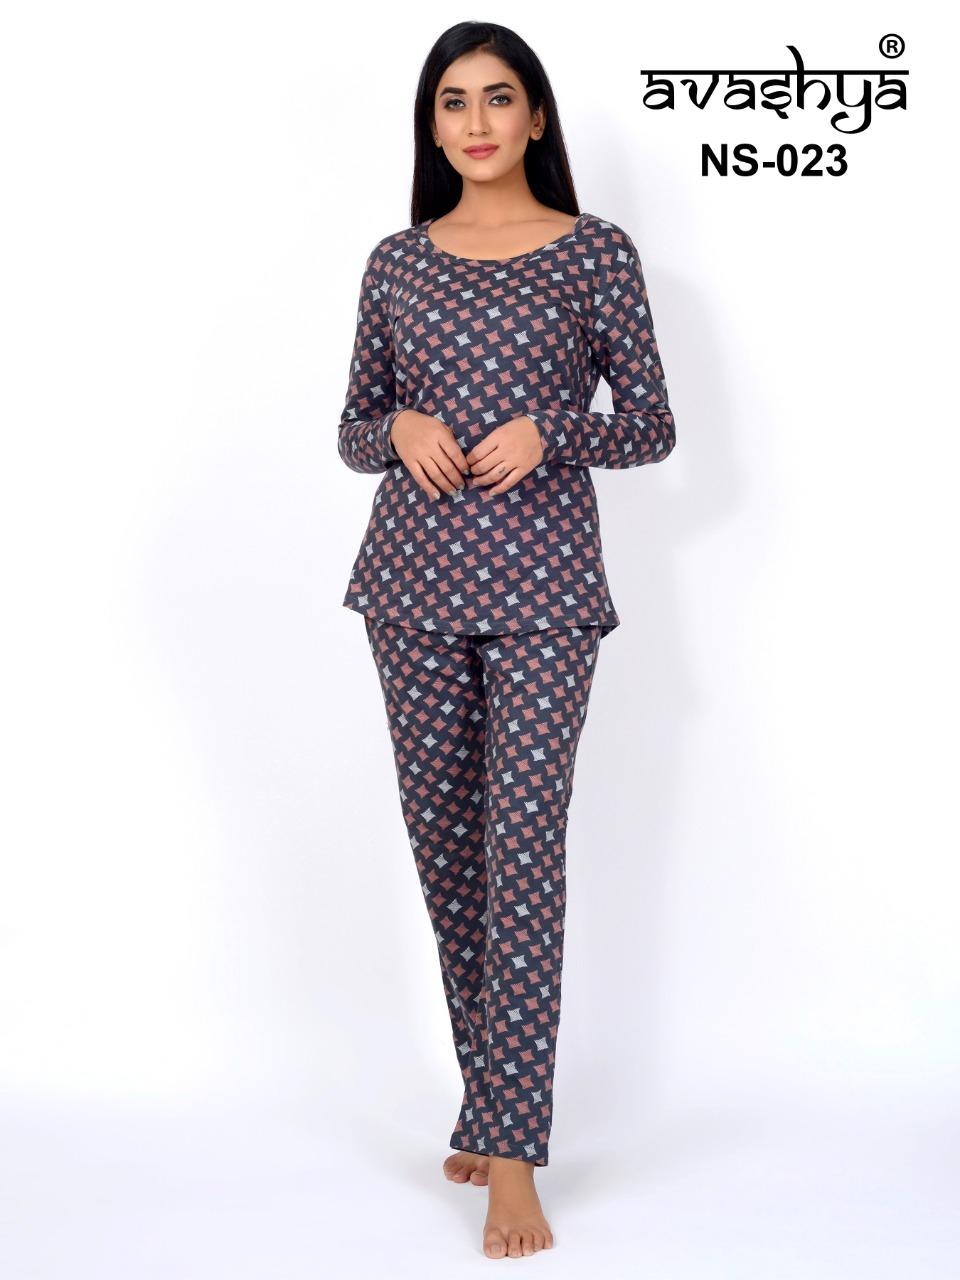 Avashya Premium Night Wear Vol 3 Wholesale Catalog 6 Pcs 1 - Avashya Premium Night Wear Vol 3 Wholesale Catalog 6 Pcs